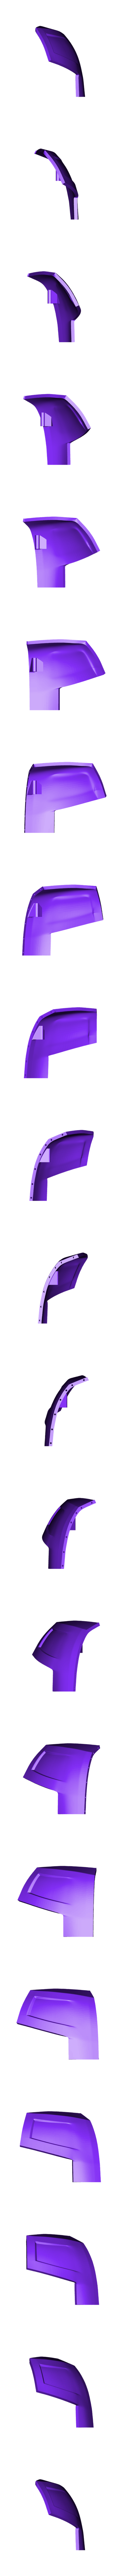 Mask 1 left.stl Download STL file Iron Man Mark 42  • 3D printing object, SKUPERDIY